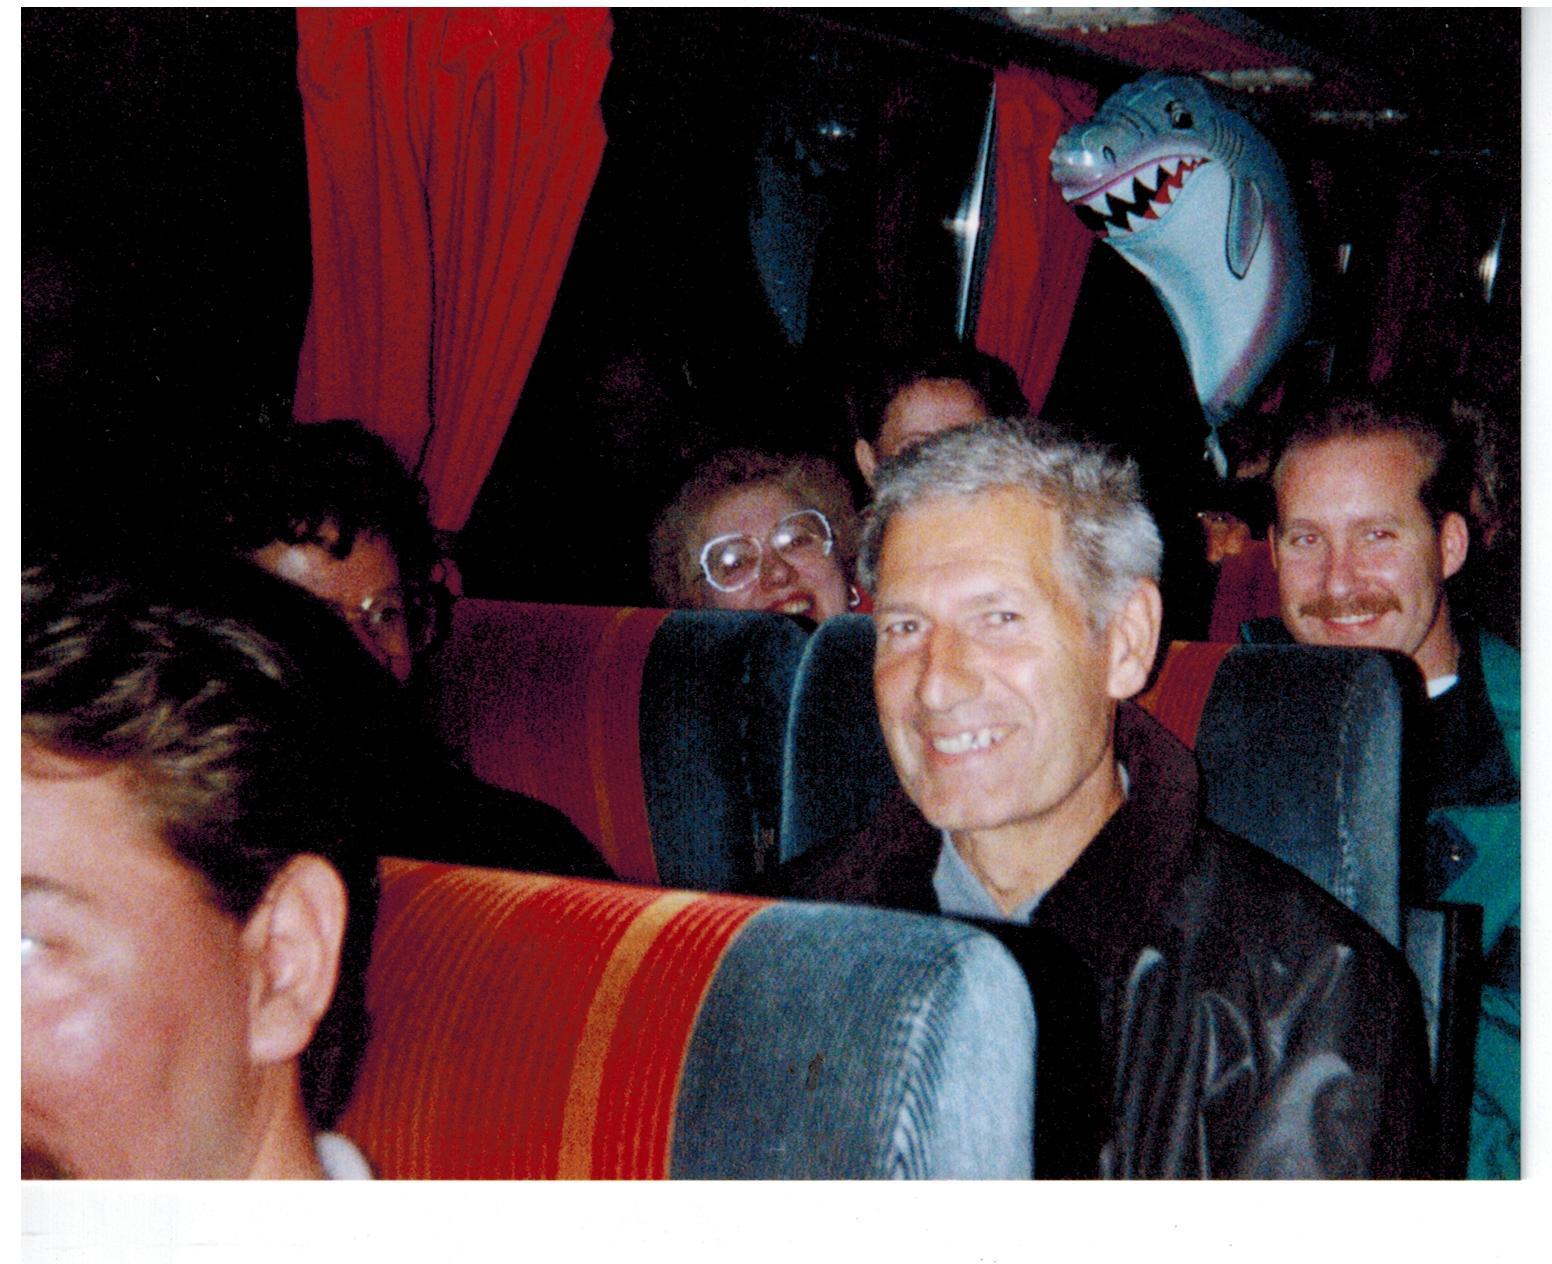 F307_Walsall-illuminations[1990